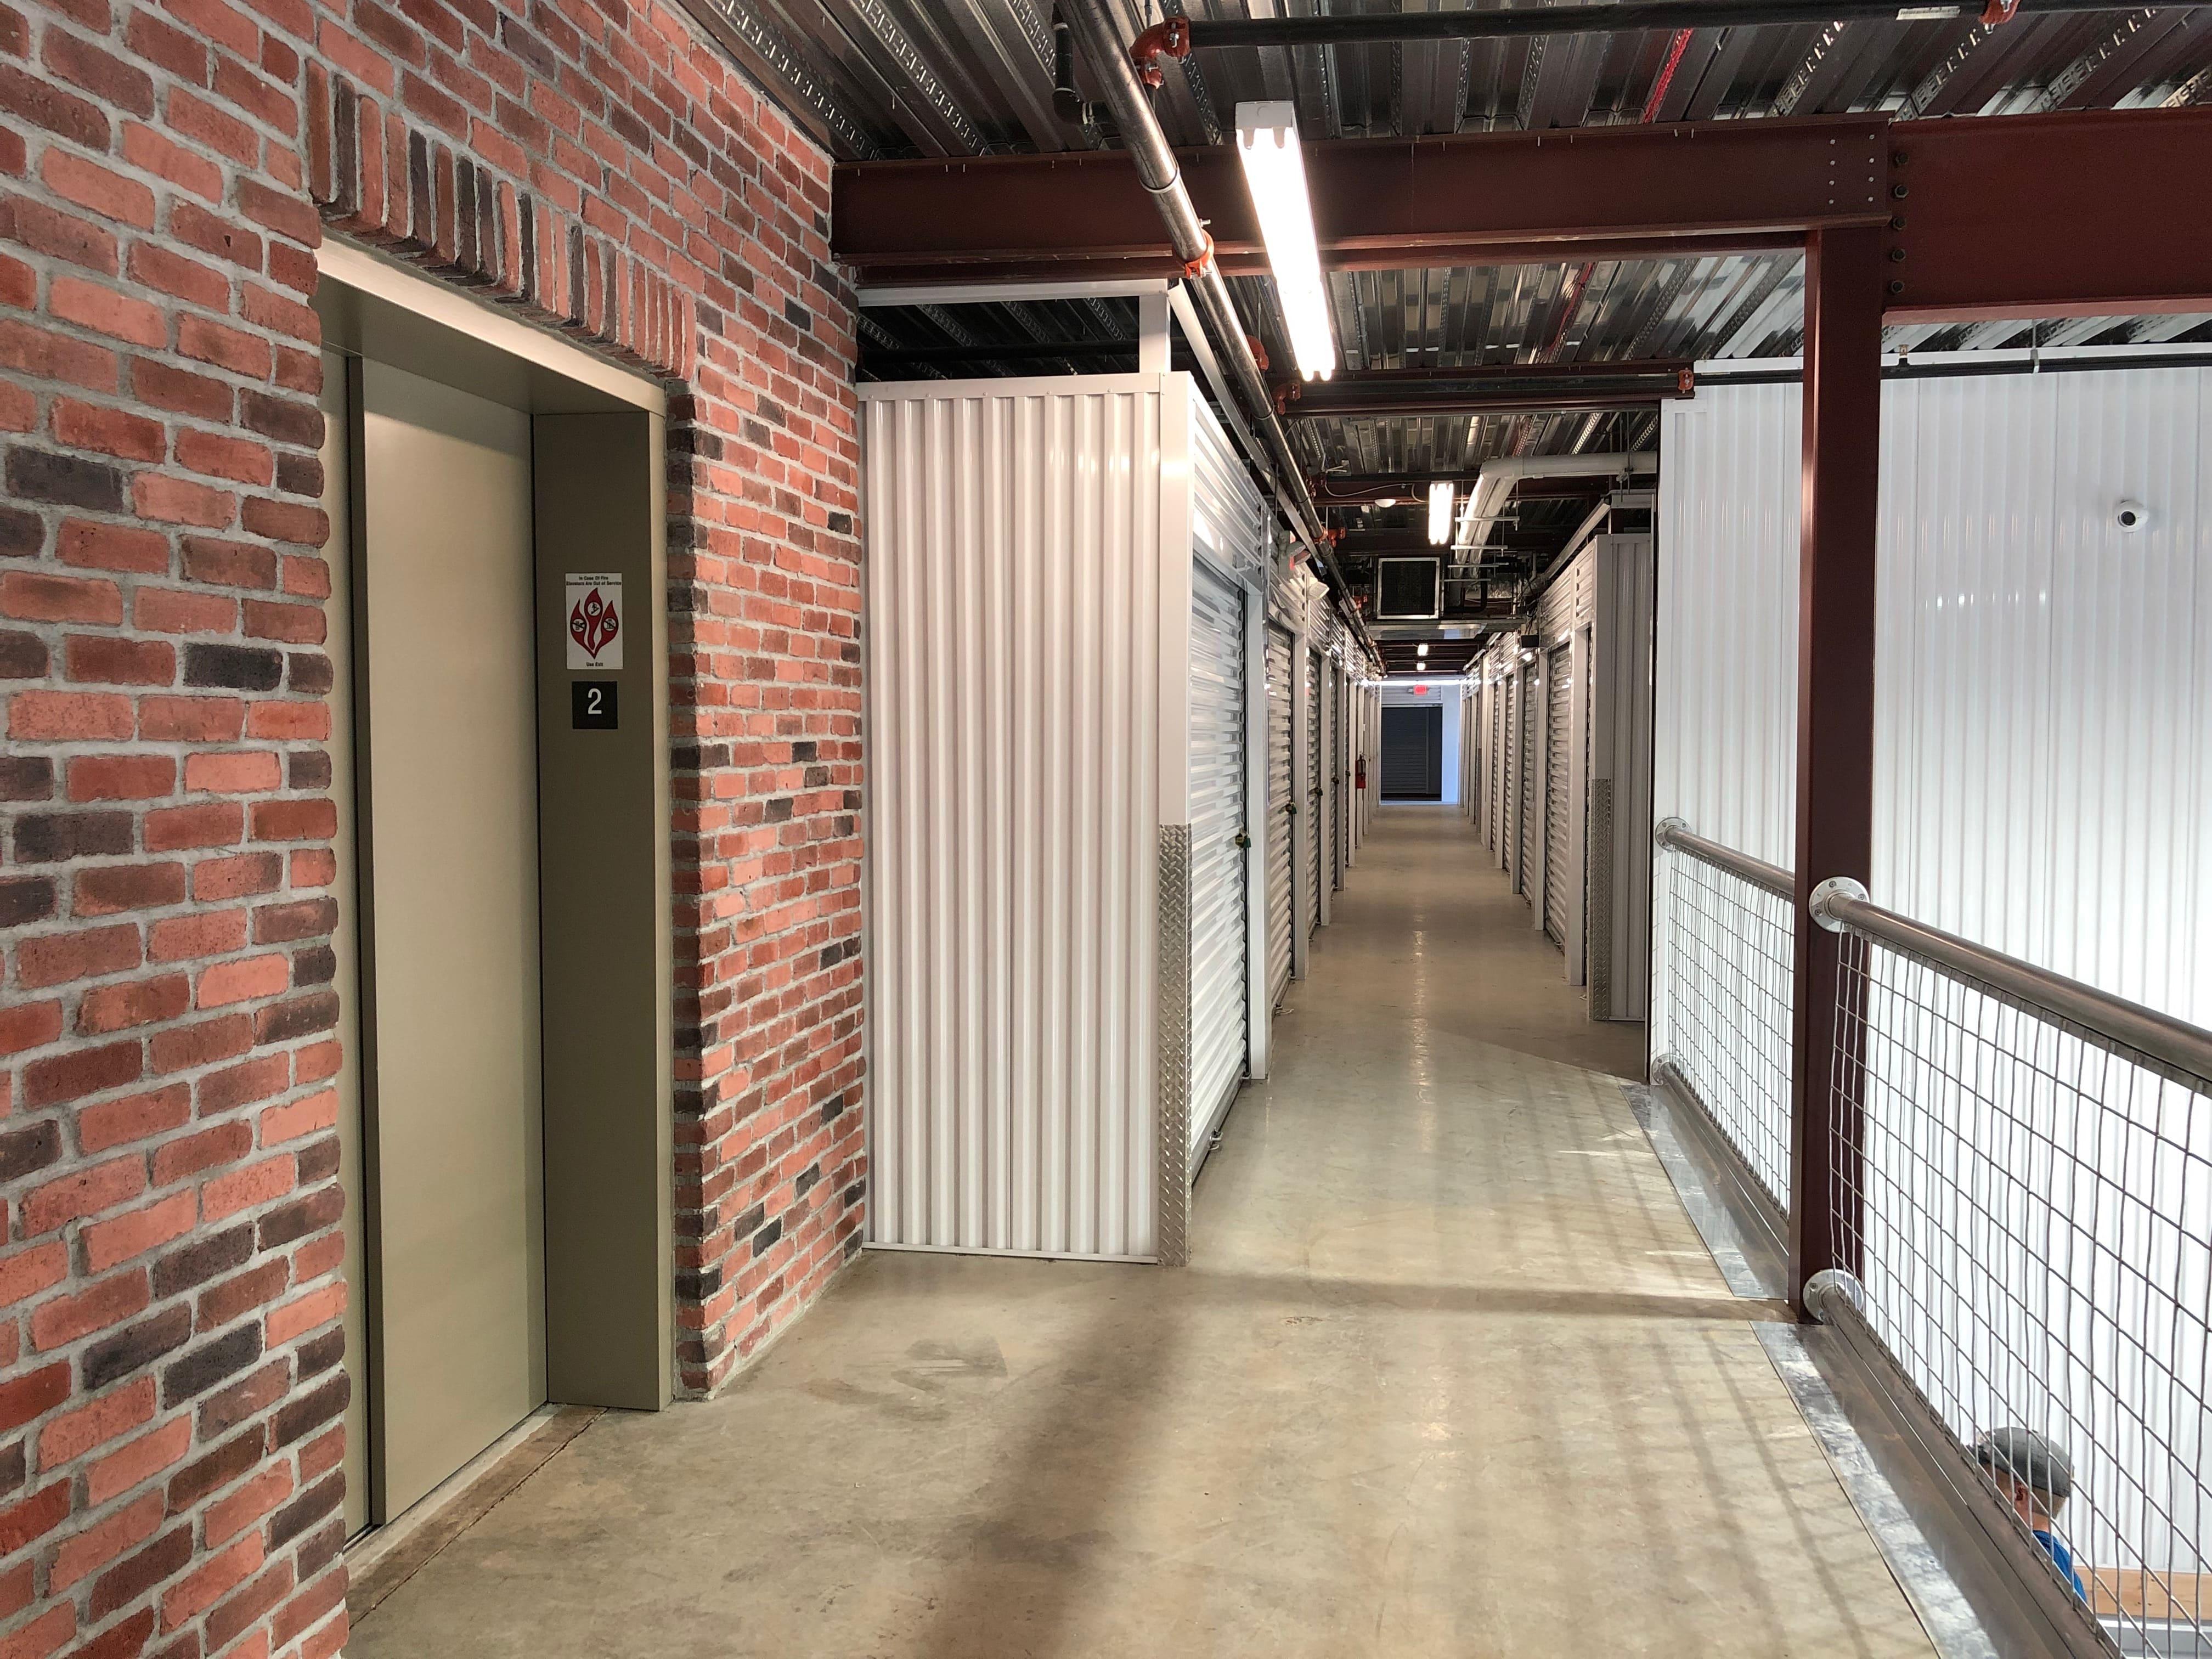 Elevator Access to Upper Level Storage